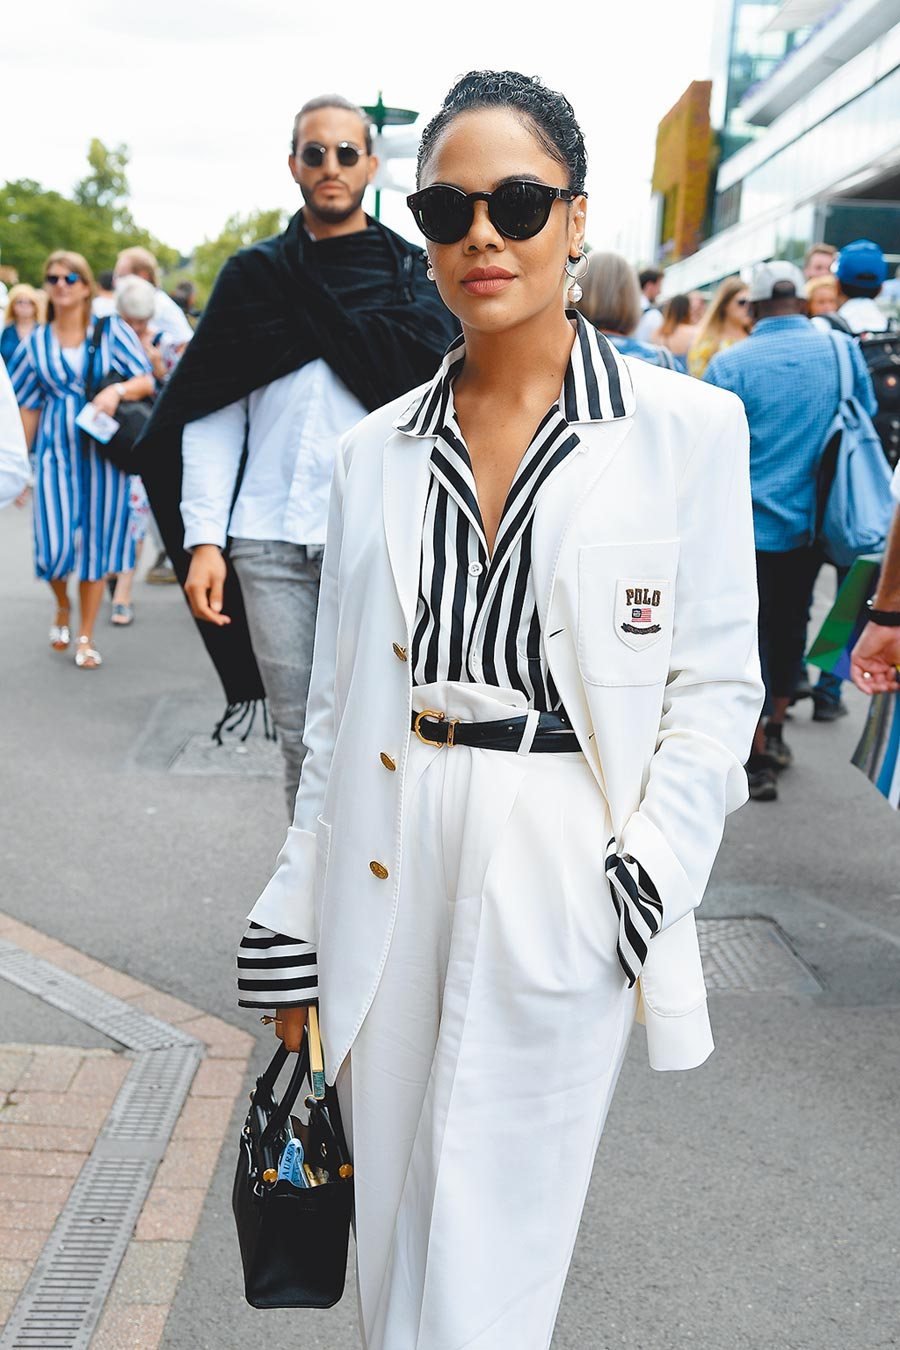 《MIB星際戰警:跨國行動》女星泰莎湯普森出席溫布敦網球錦標賽,Polo Ralph Lauren黑白條紋襯衫外搭logo白西裝,帥氣又搶眼。(CFP)